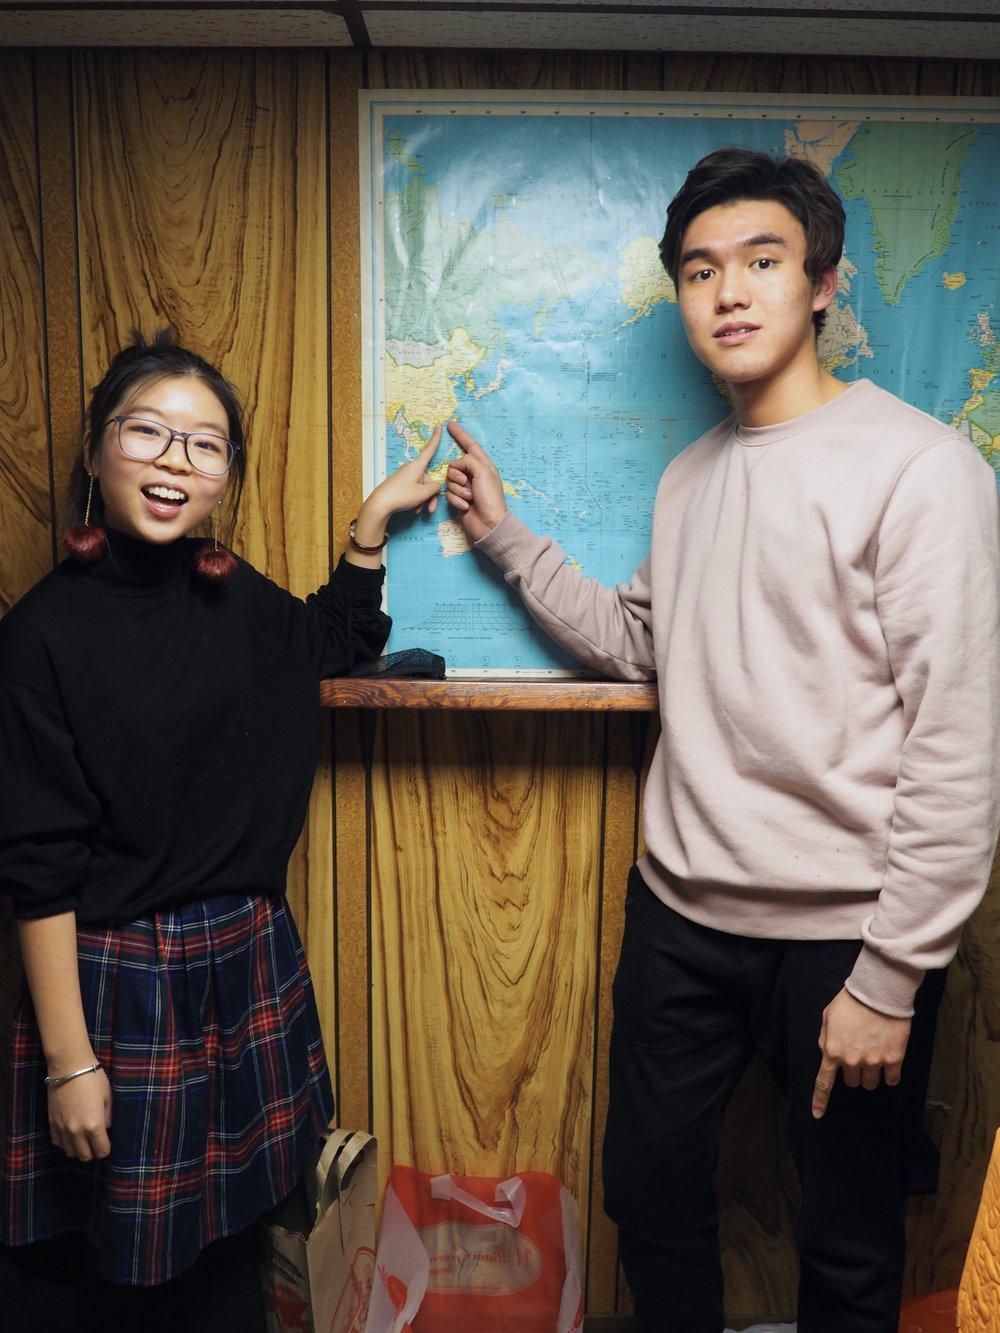 Tammy: China